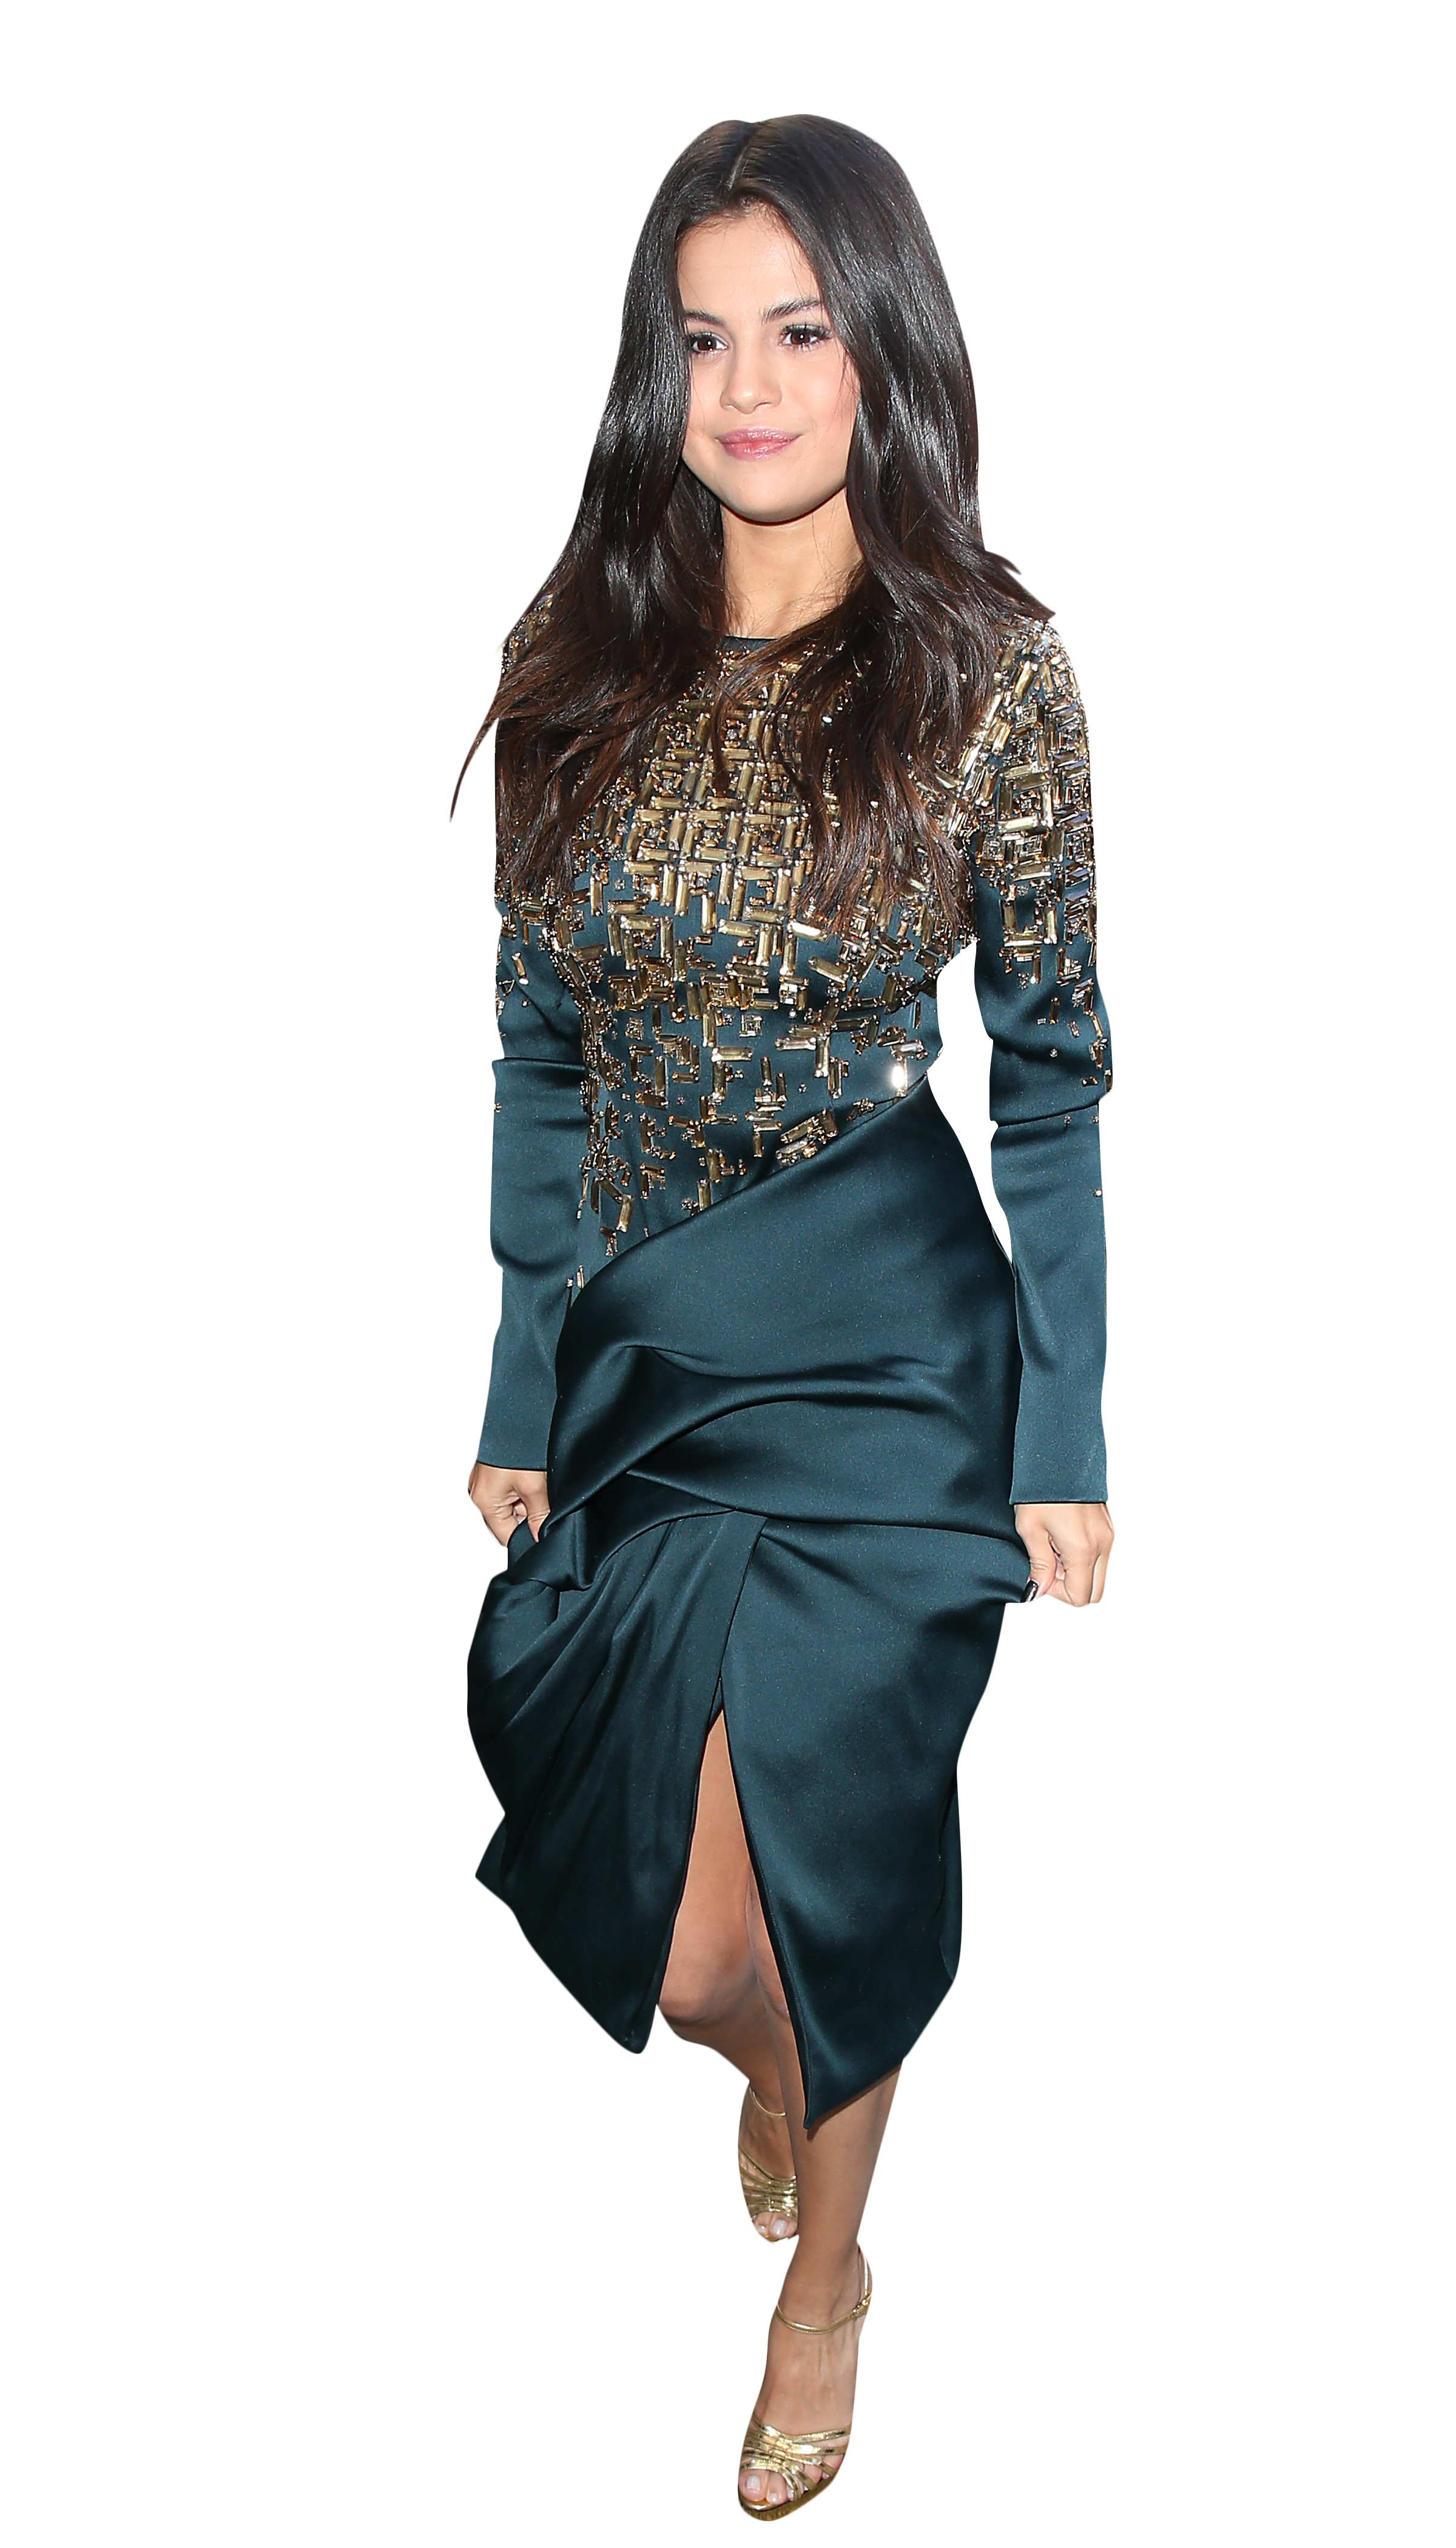 Selena Gomez Blue Dress PNG Image